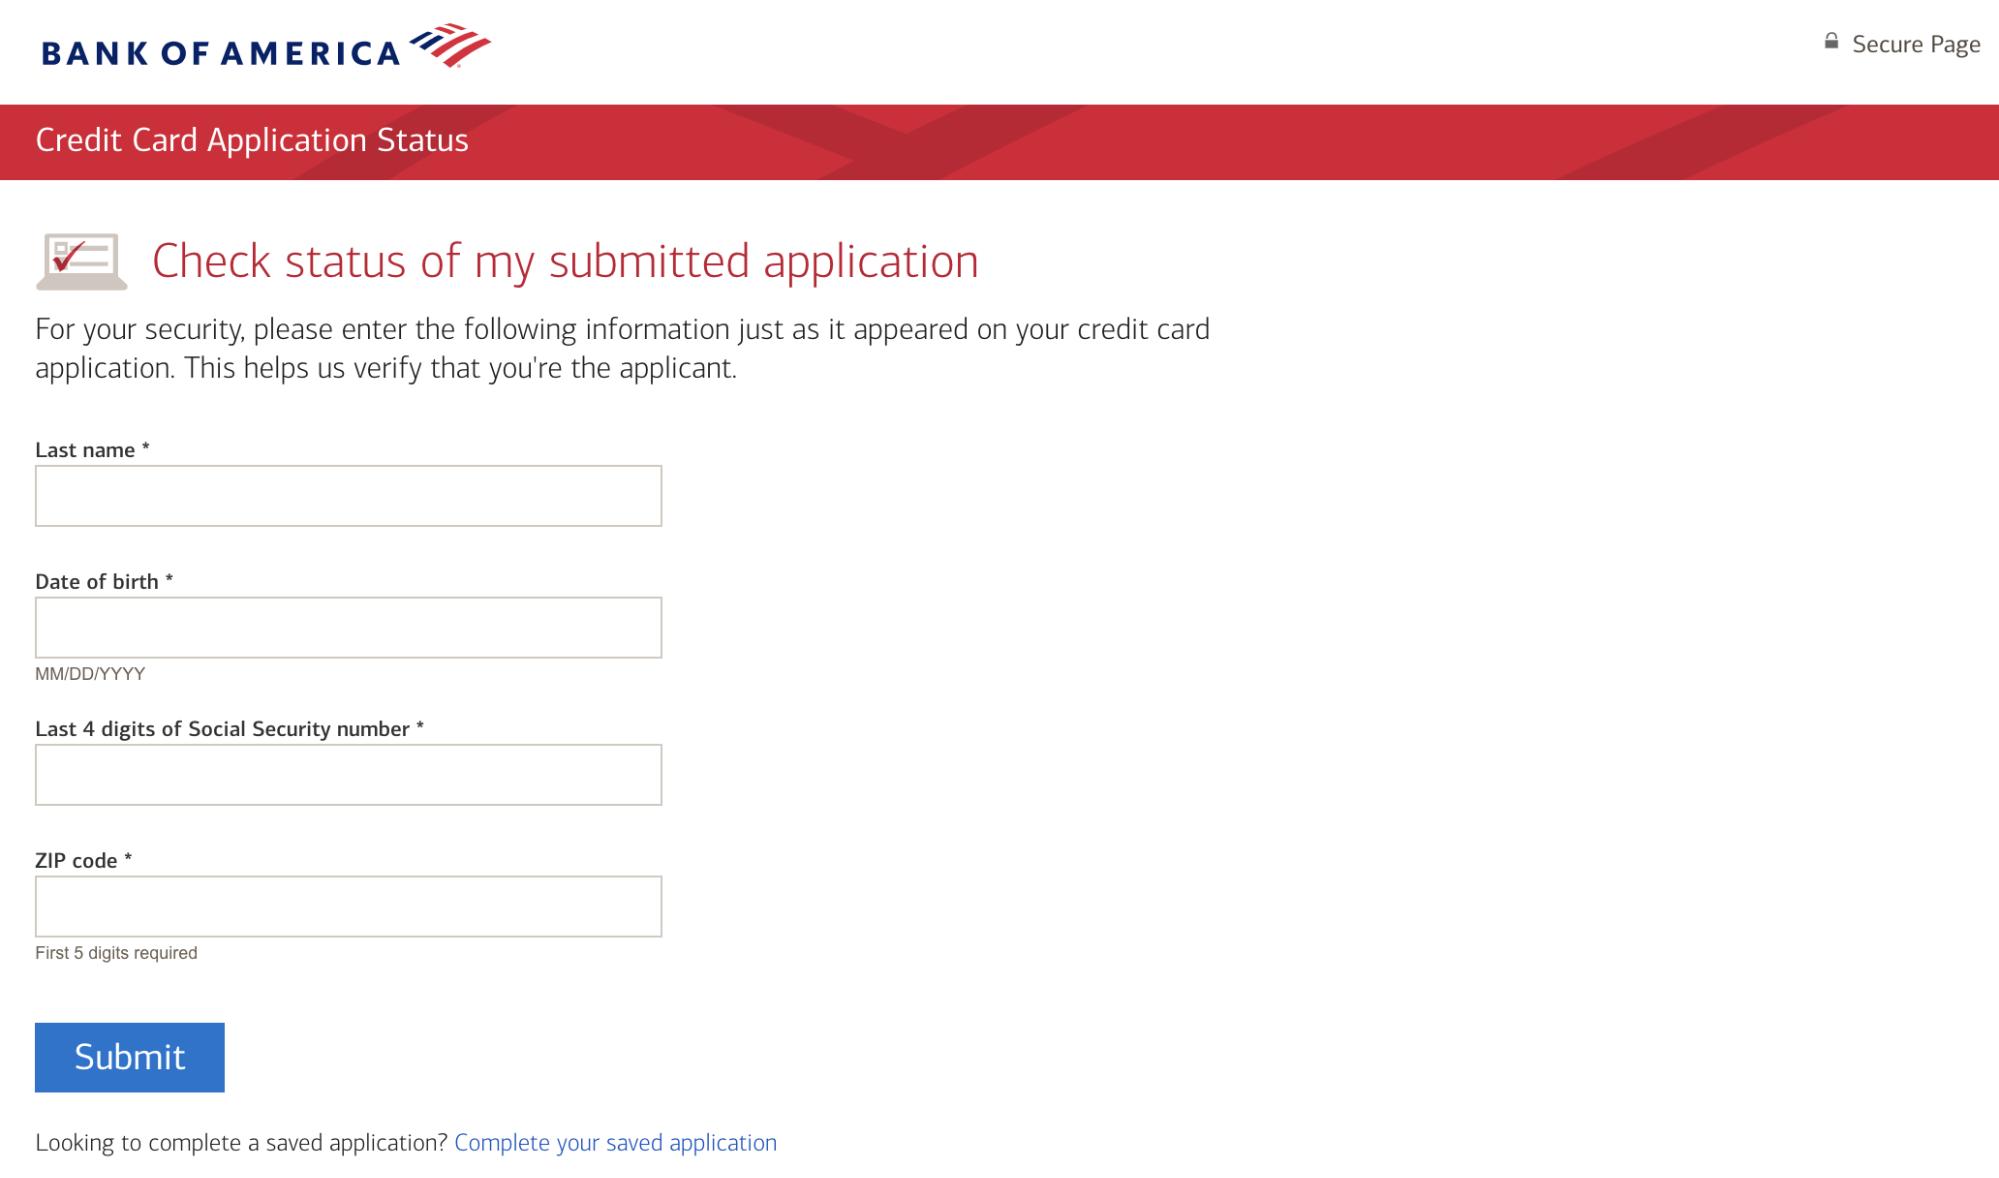 BofA - Online App Check